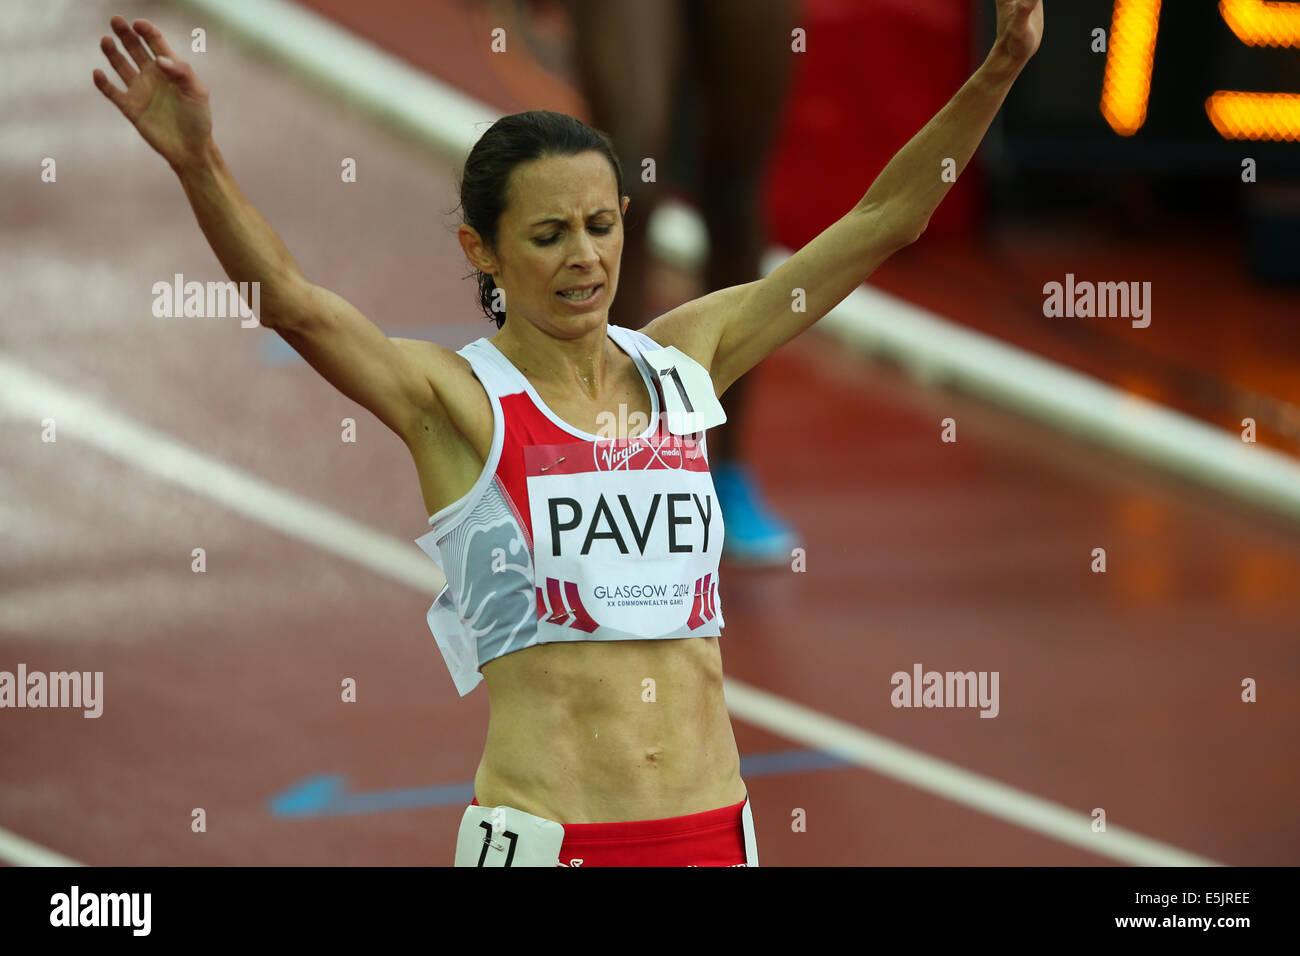 Hampden Park Glasgow 2 August 2014. Commonwealth Games day 10.  Women's 5000m final.  Gold - Mercy Cherono KEN; - Stock Image